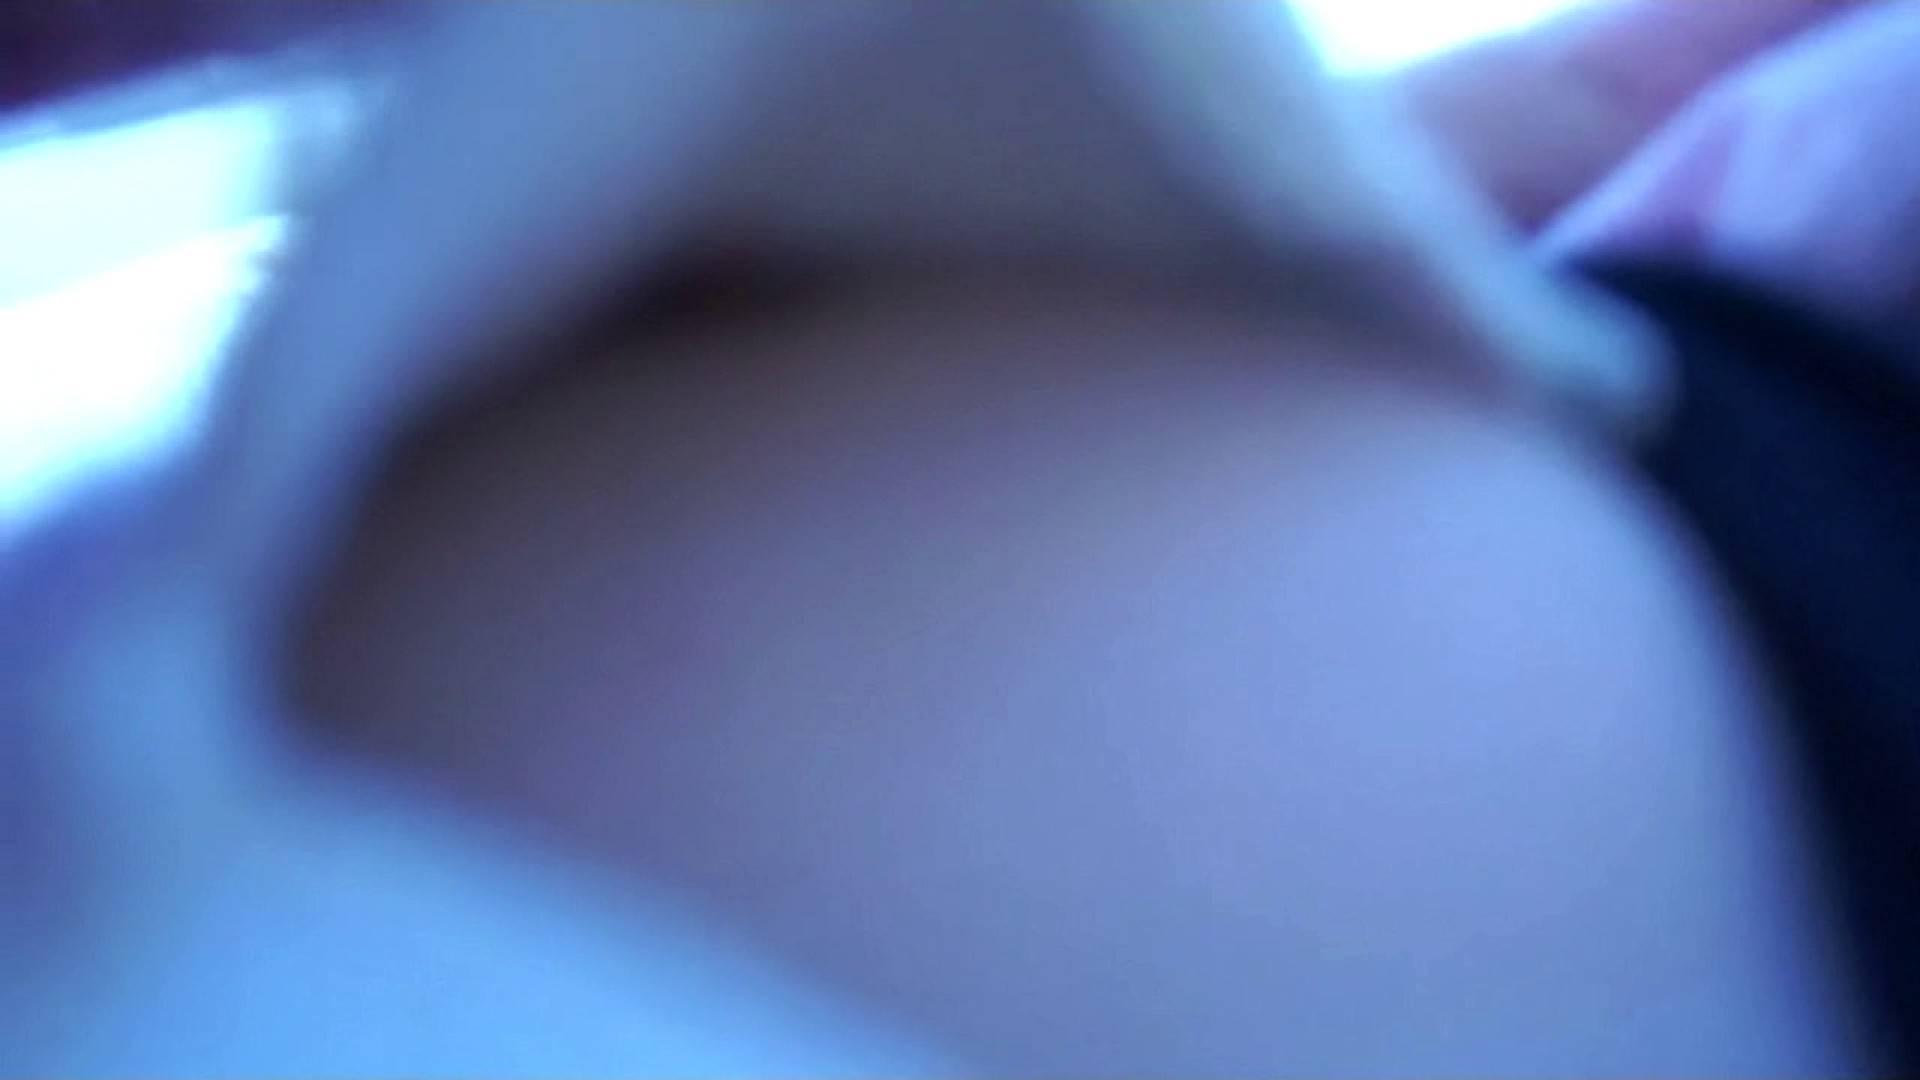 vol.21 久しぶりに味わったまどかの体 OLハメ撮り  80Pix 43